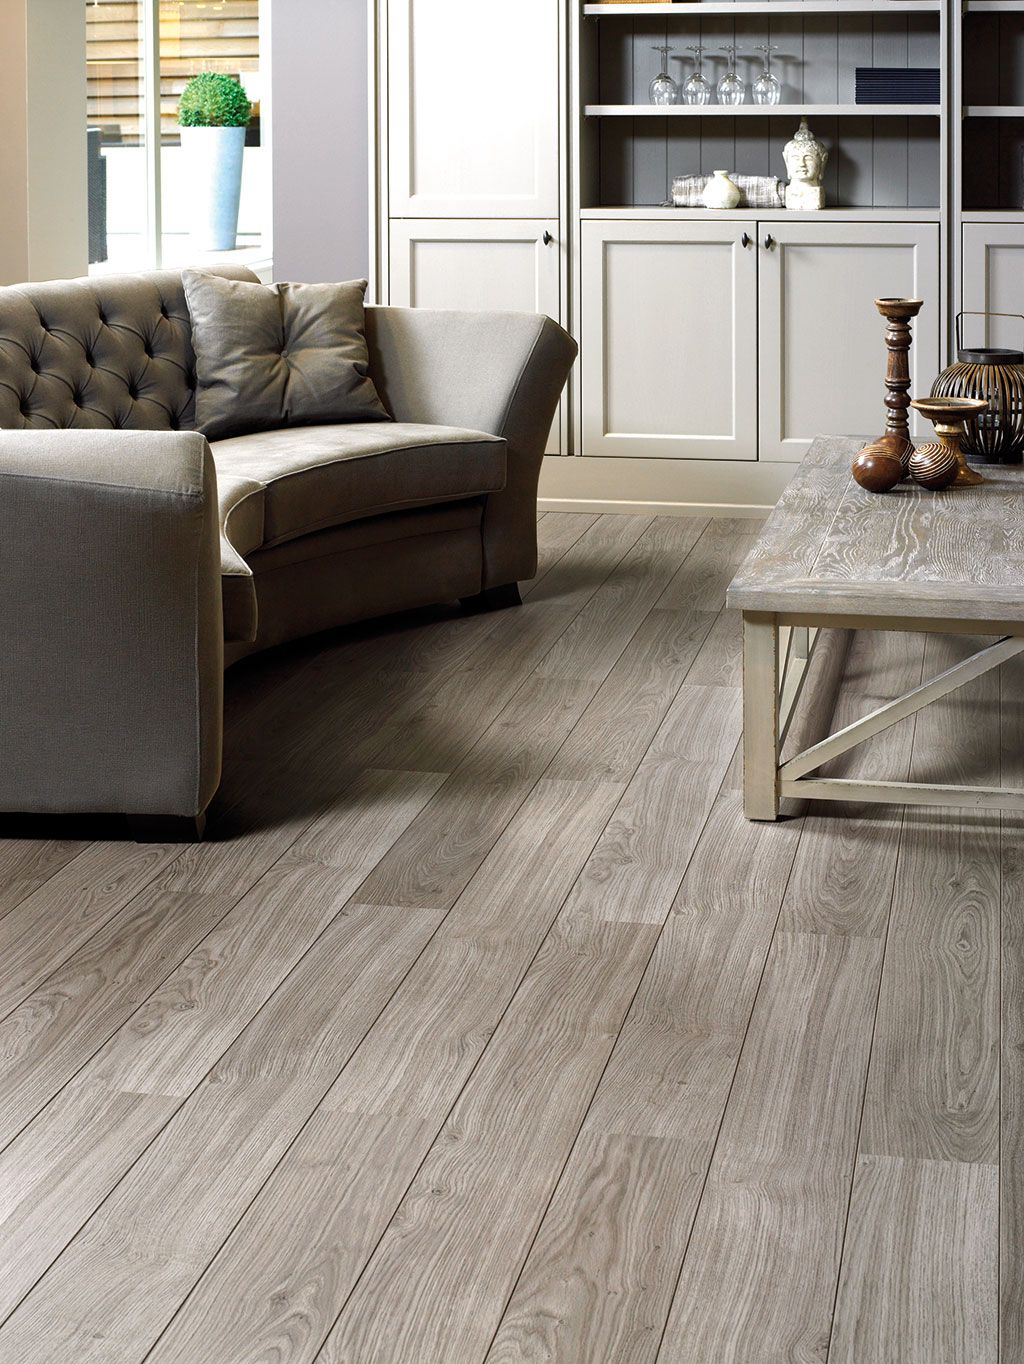 QuickStep Laminate Flooring Perspective 'Light grey